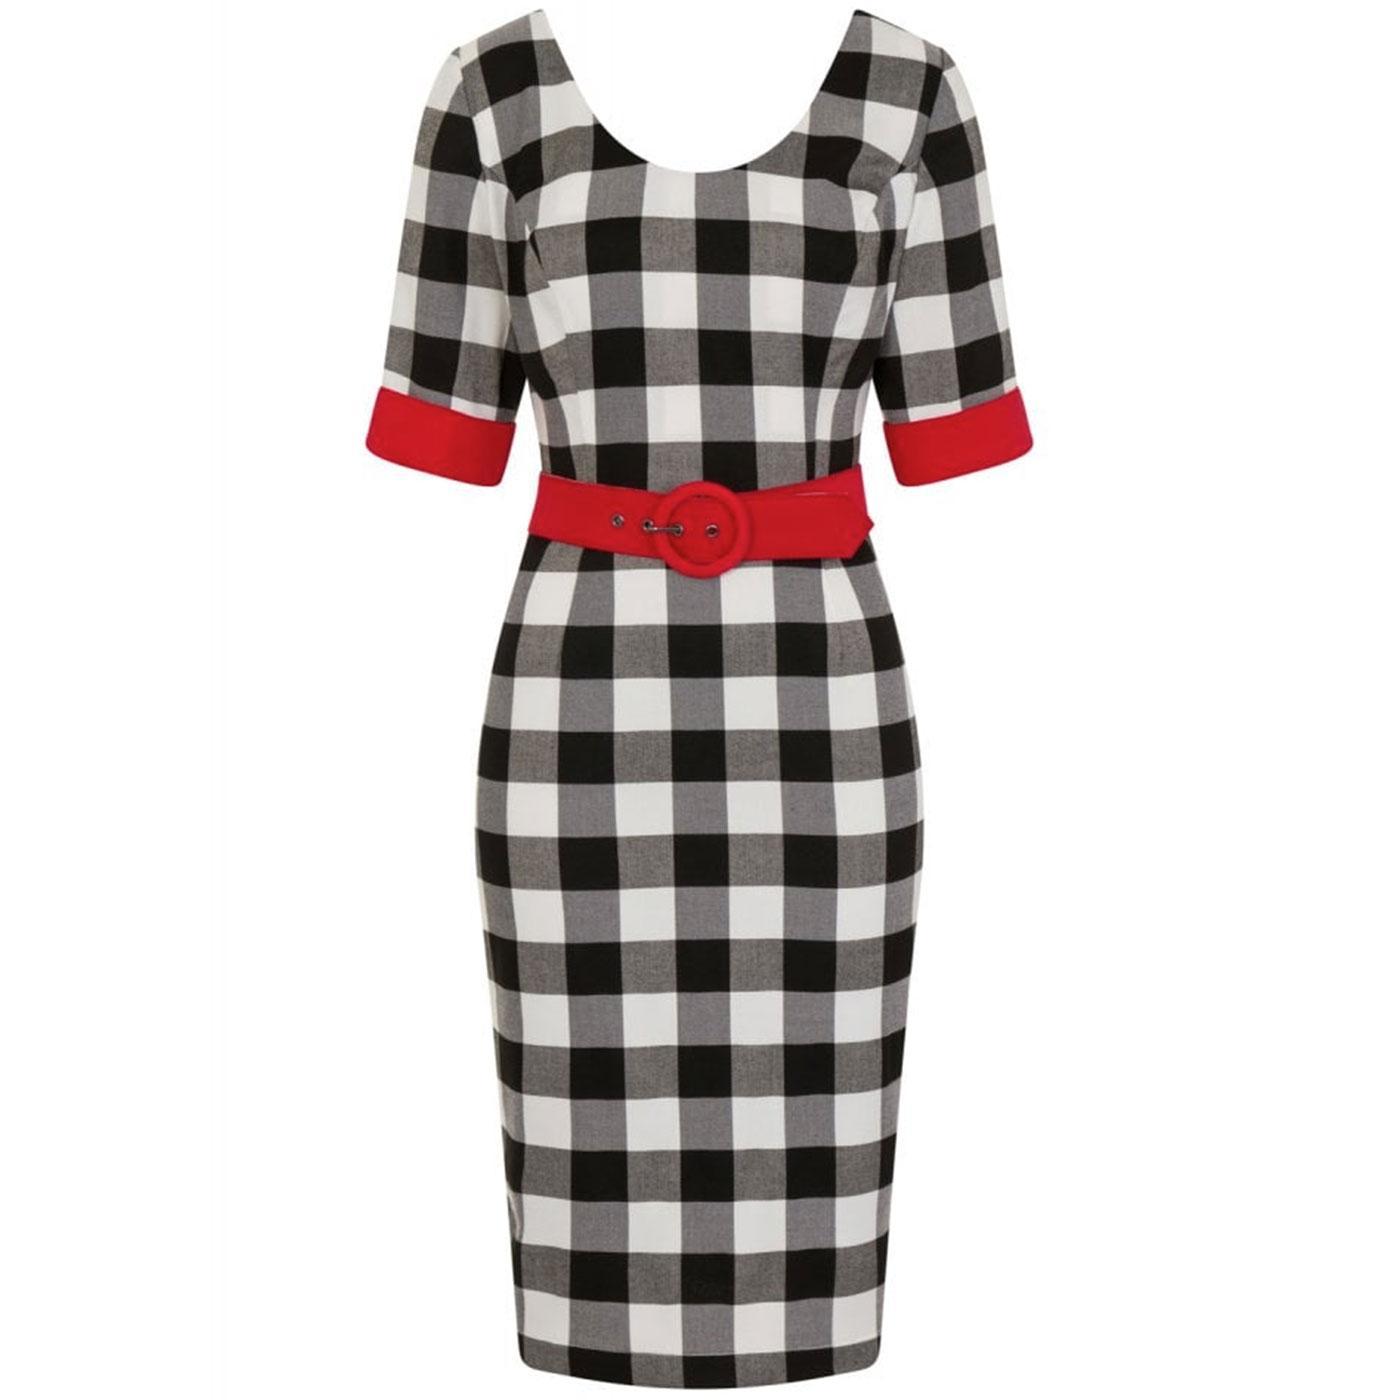 June COLLECTIF Vintage Gingham Pencil Dress B/W